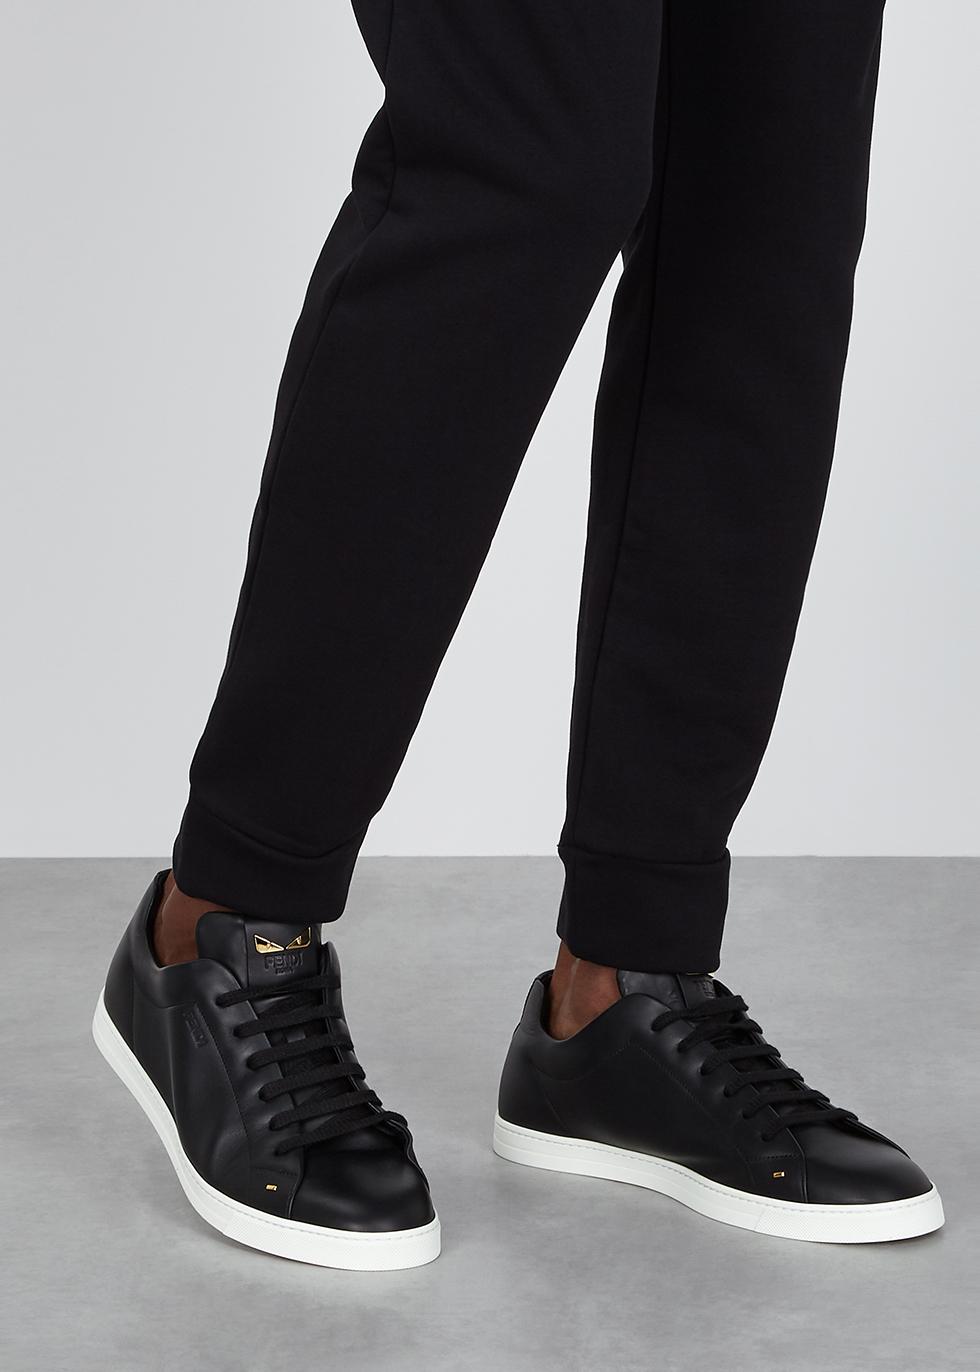 Fendi Black leather sneakers - Harvey